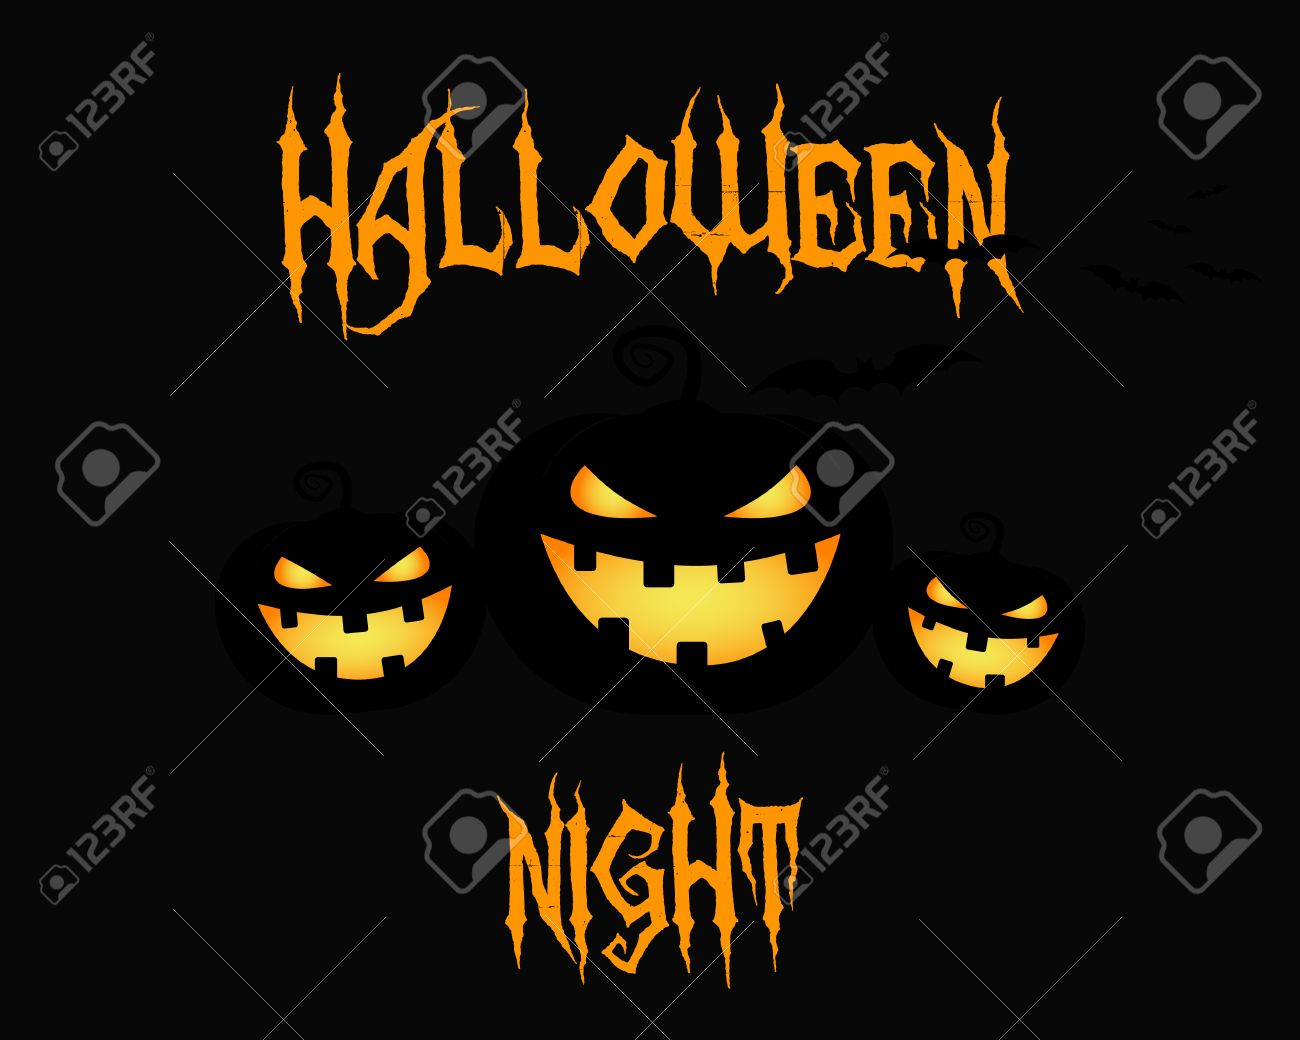 Happy Halloween Party Night Card. Halloween Pumpkin, Dark Design.  Background, Poster And